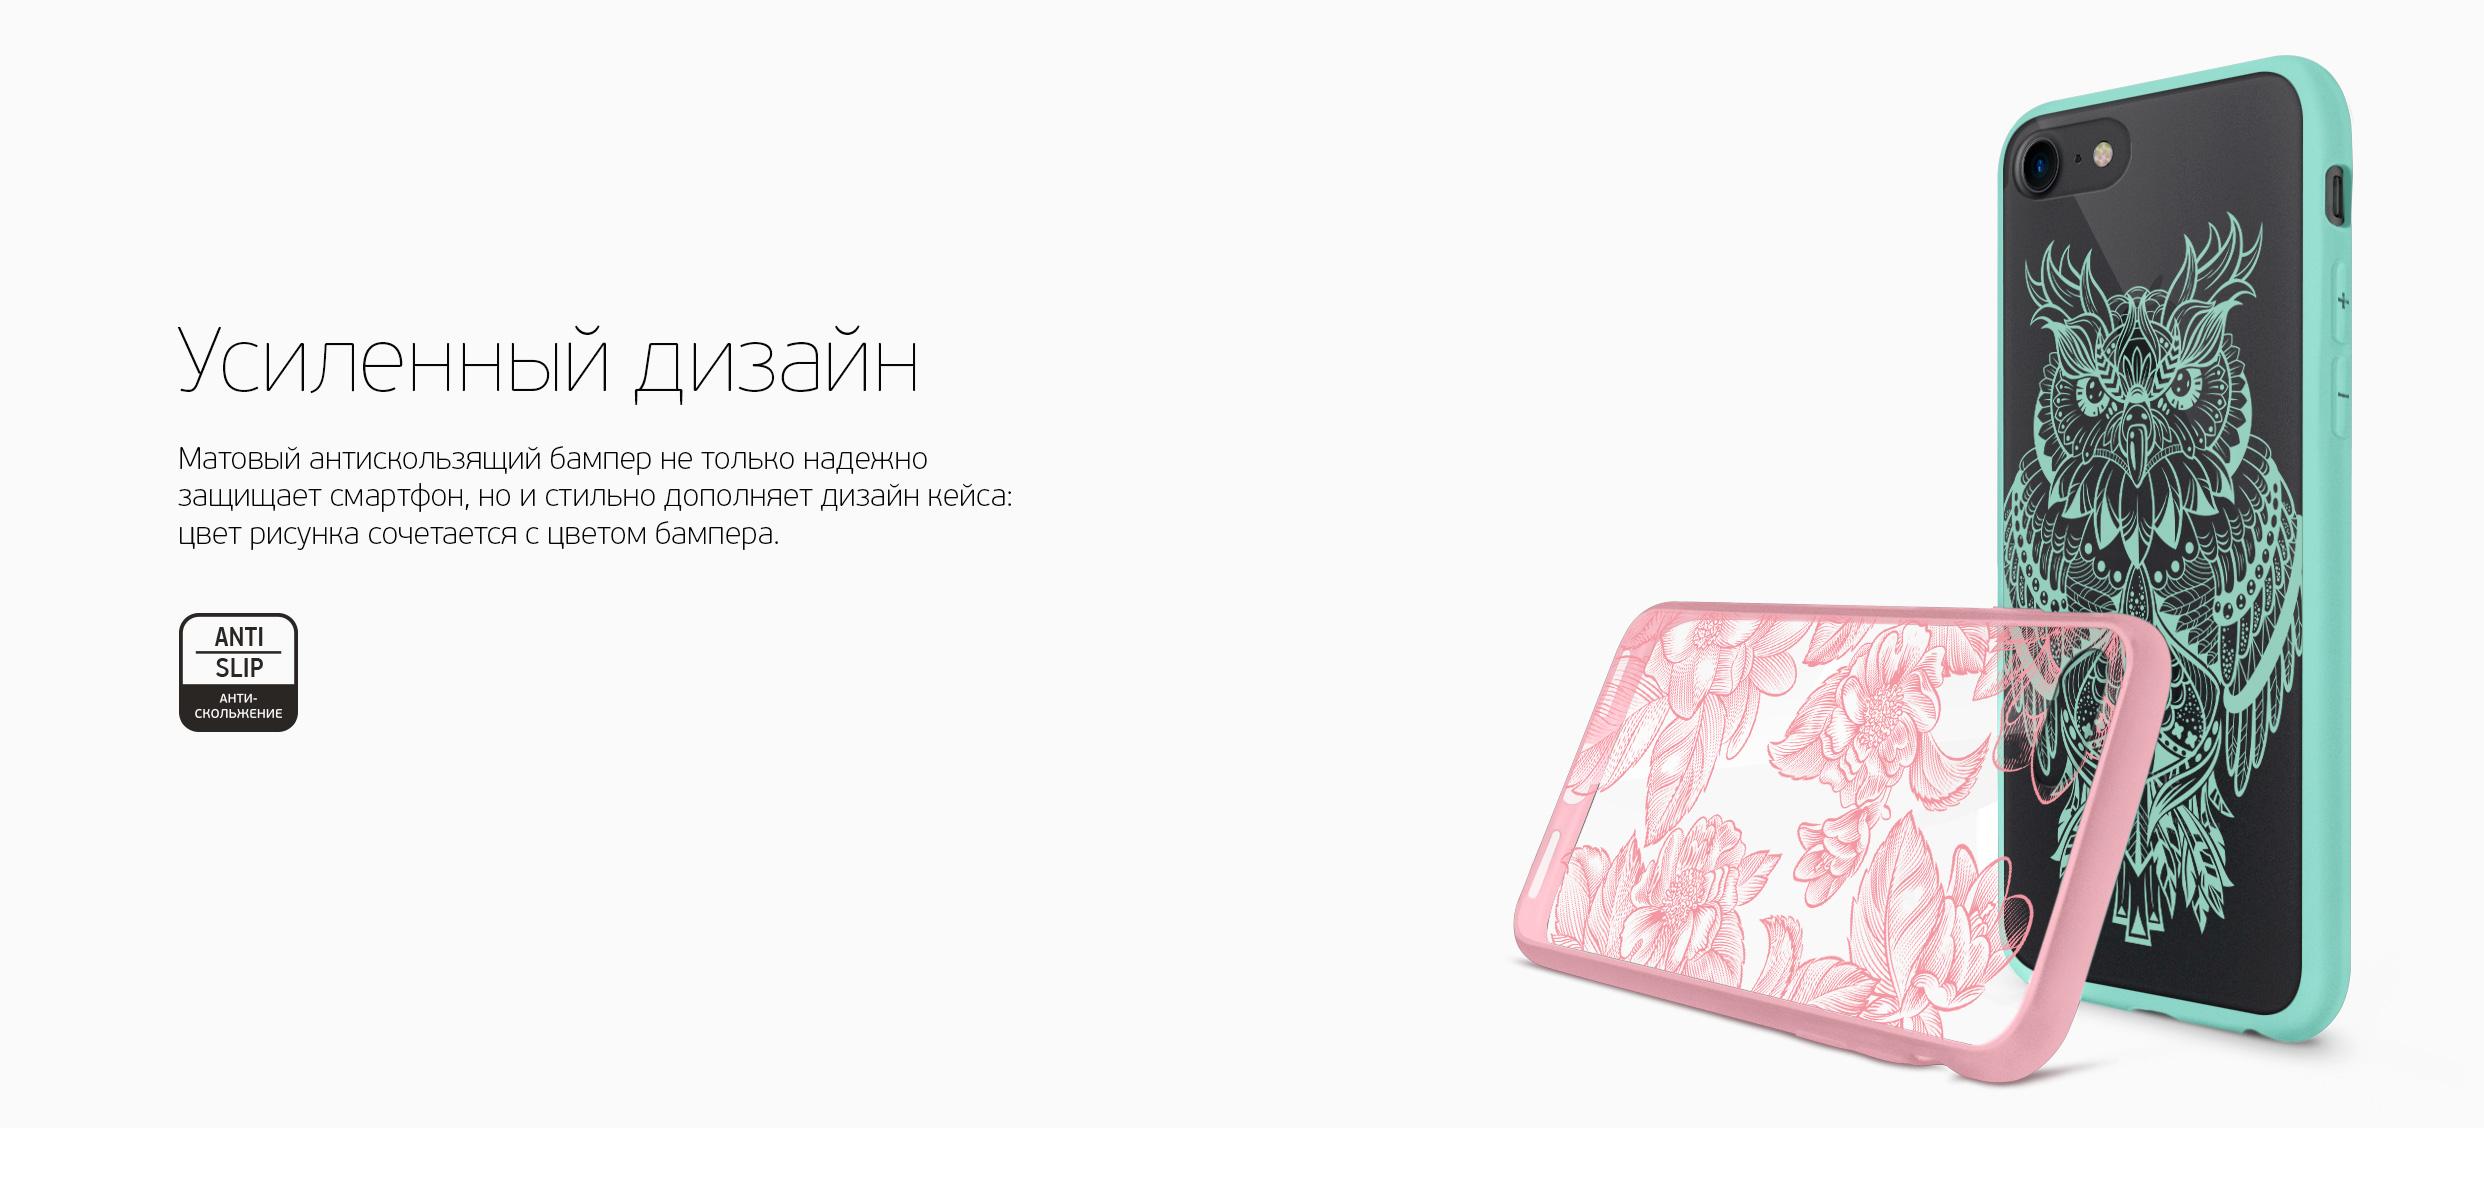 обзор-NEO-ART_iPhone-7-RUS_01.jpg